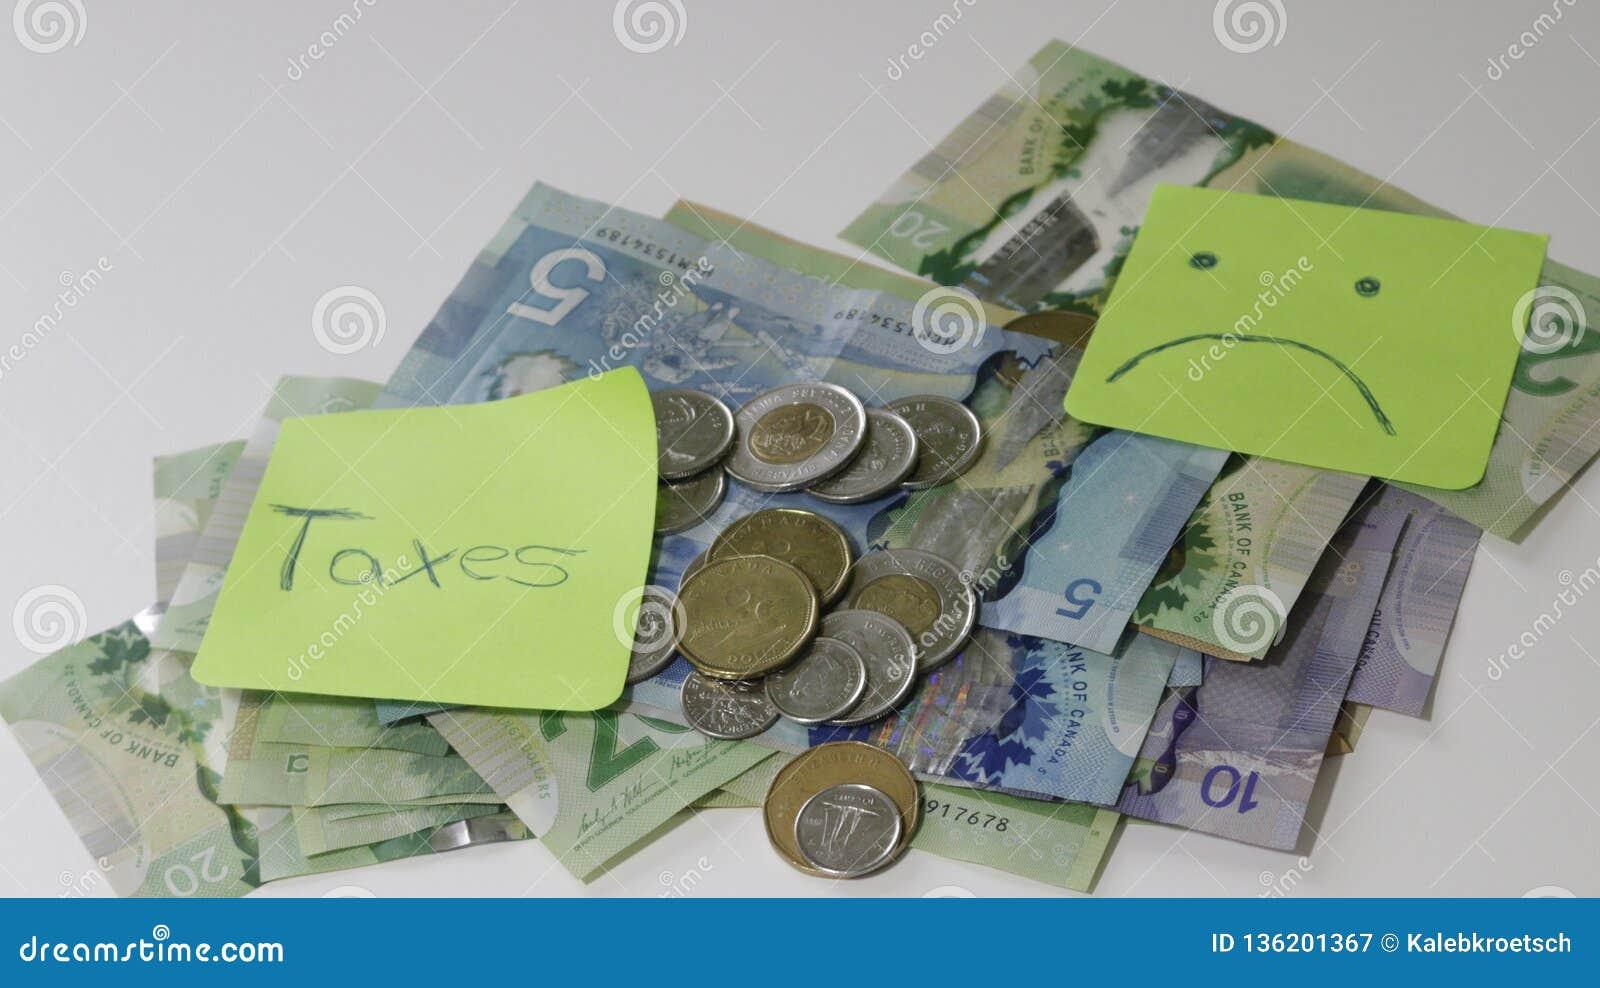 Reembolso de imposto canadense soletrado com telhas da letra e notas do dólar canadense